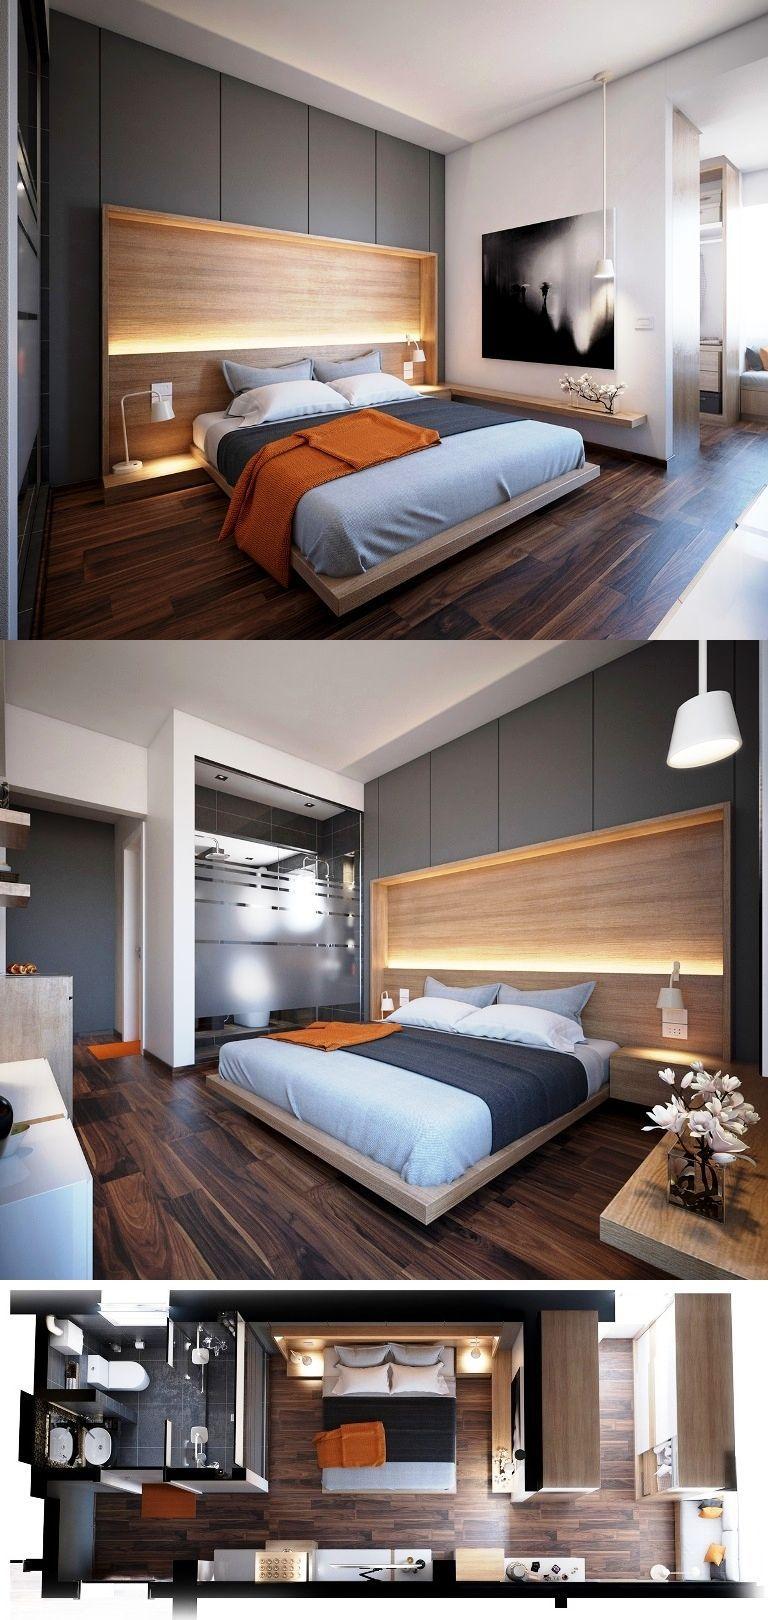 15 Refreshing Master Bedroom Design Ideas For Renovation Or